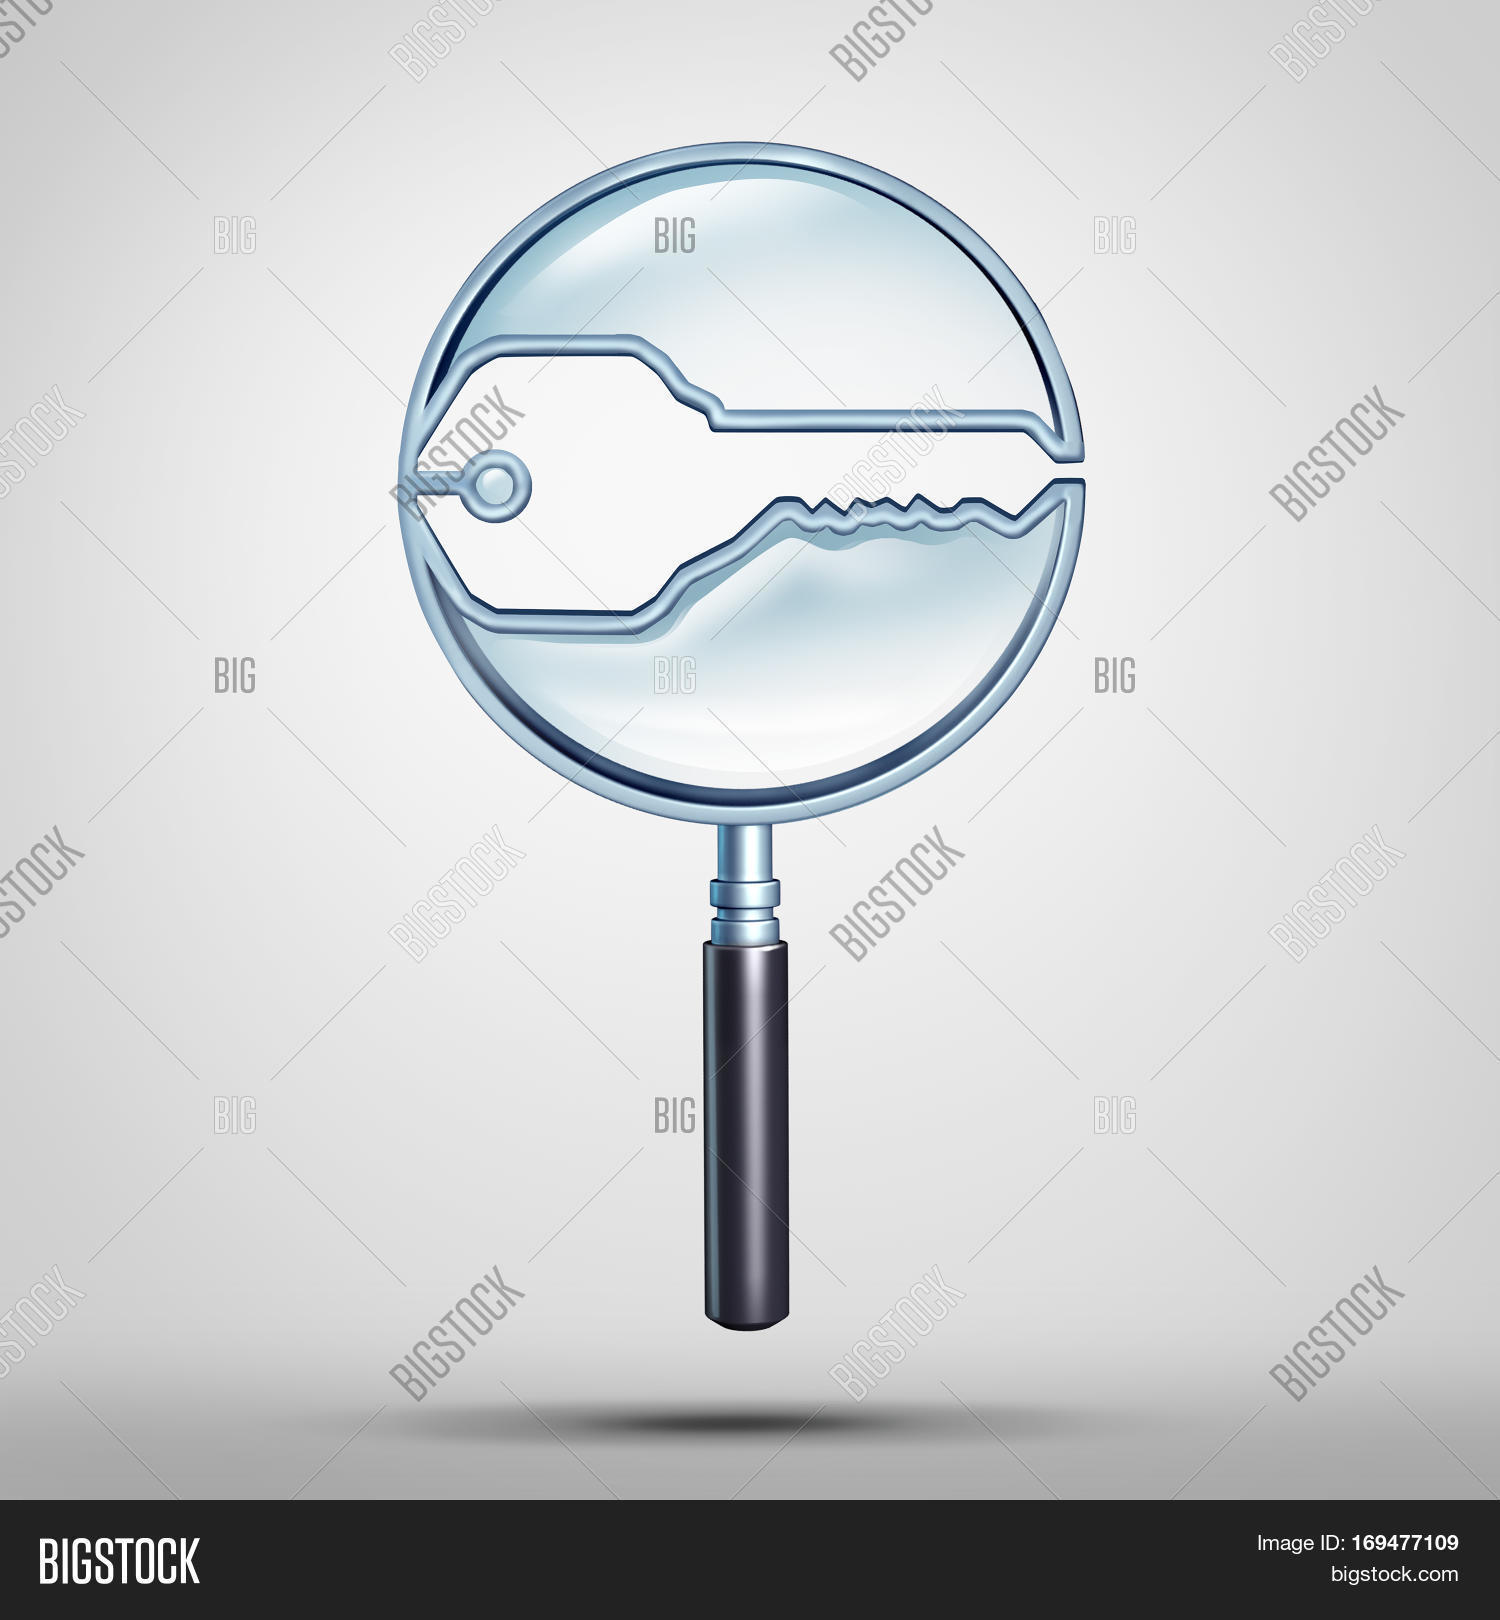 Key Search Symbol Image & Photo (Free Trial) | Bigstock